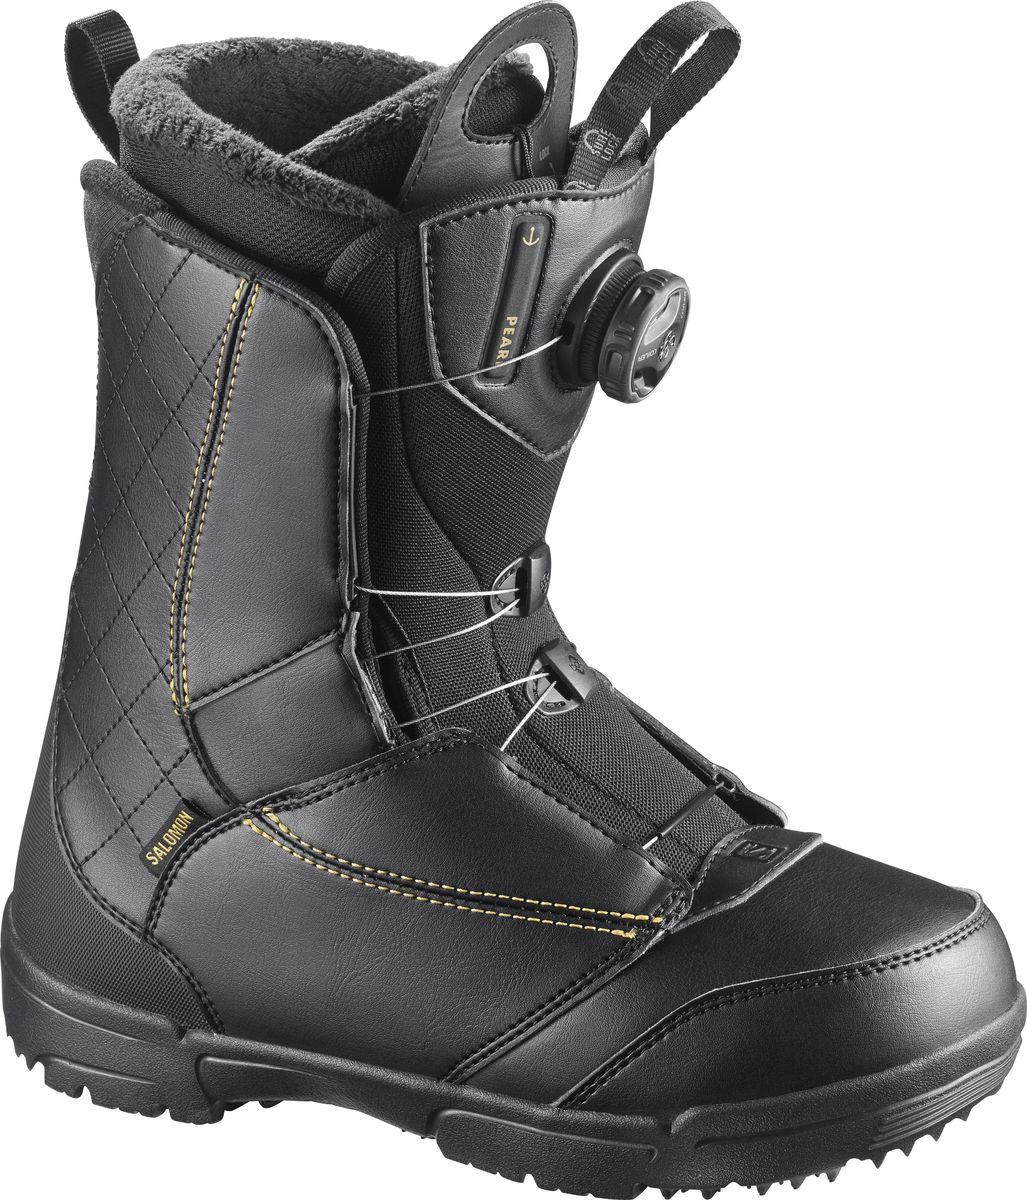 Ботинки для сноуборда Salomon Pearl Boa, цвет: черный, золотистый. Размер 25,5 (39) ботинки для сноубордов salomon pearl boa 2015 2016 37 usa 7 black purple